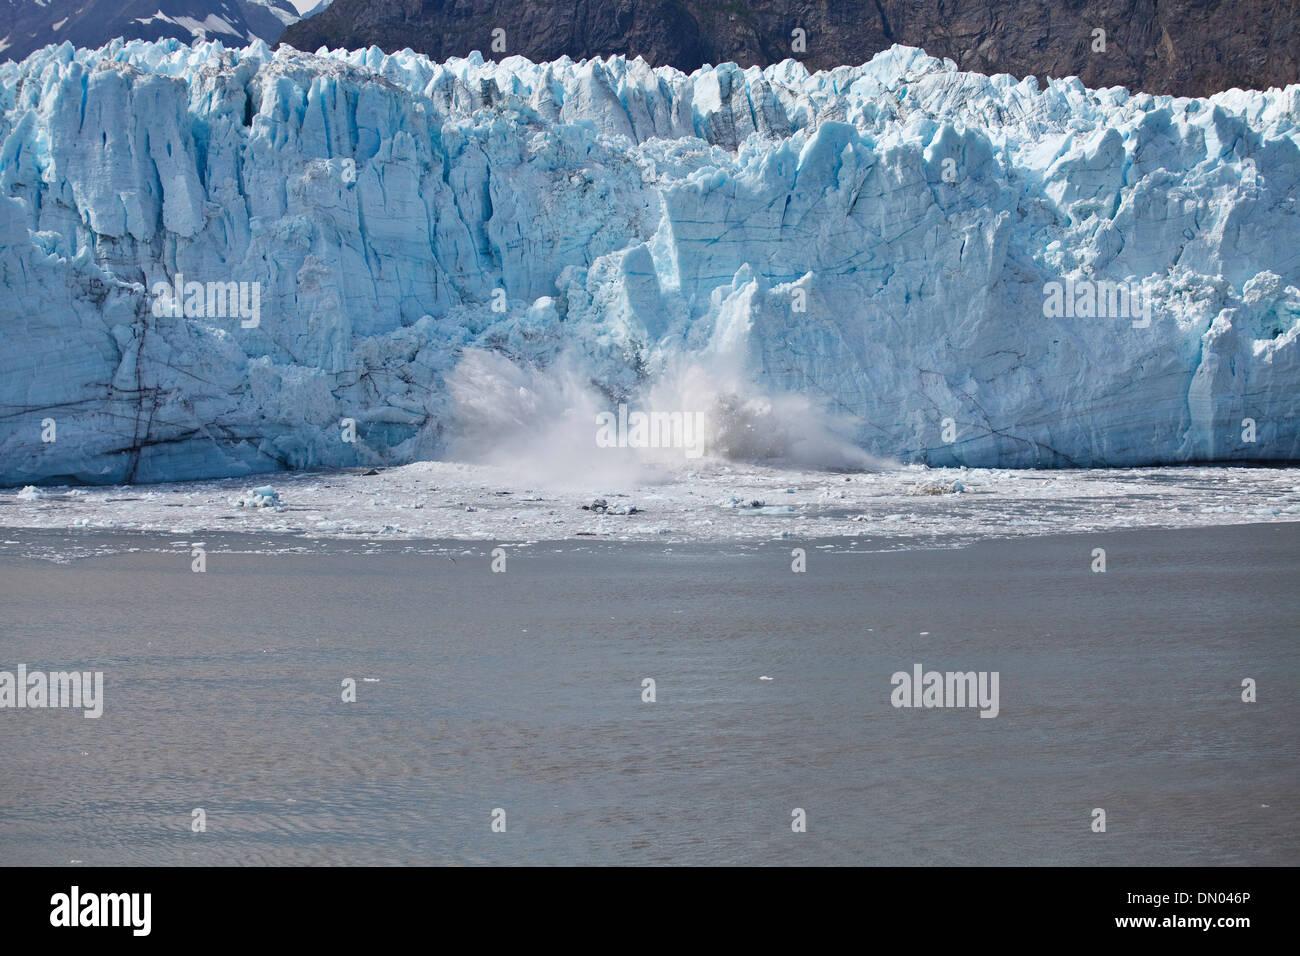 Glacier Bay, Alaska, from a cruise ship. - Stock Image